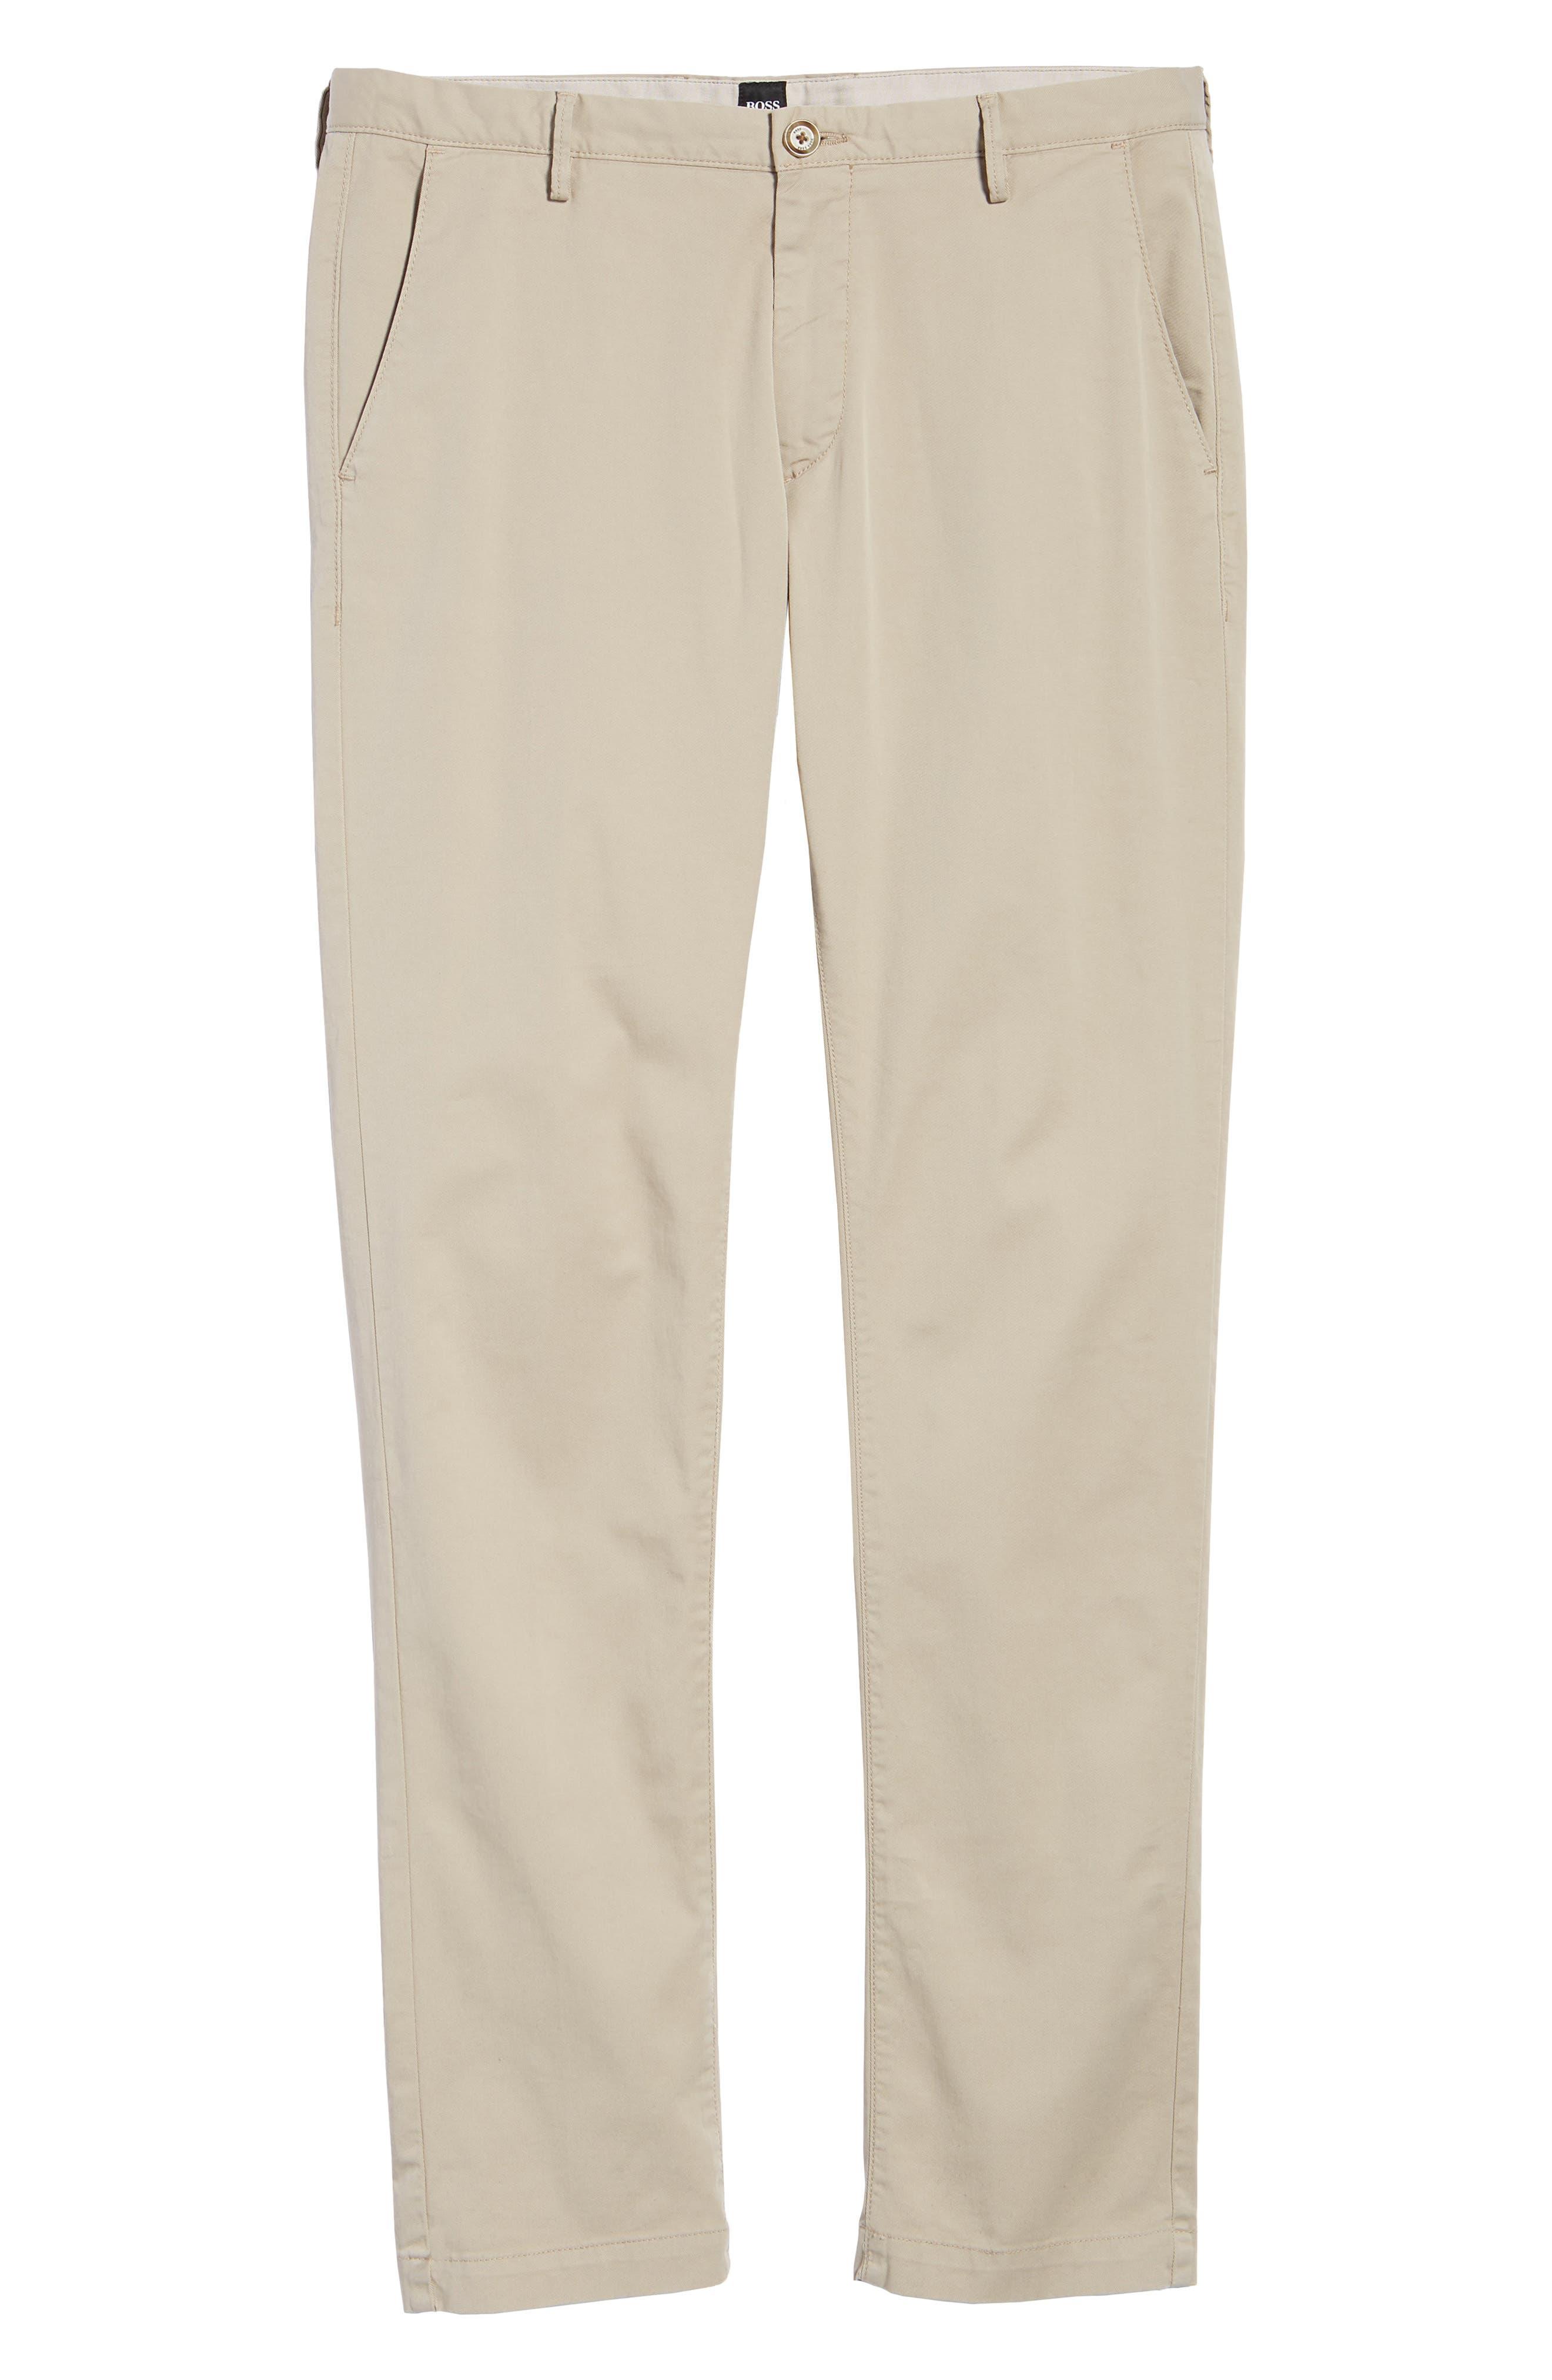 Rice Slim Fit Chino Pants,                             Alternate thumbnail 6, color,                             Brown